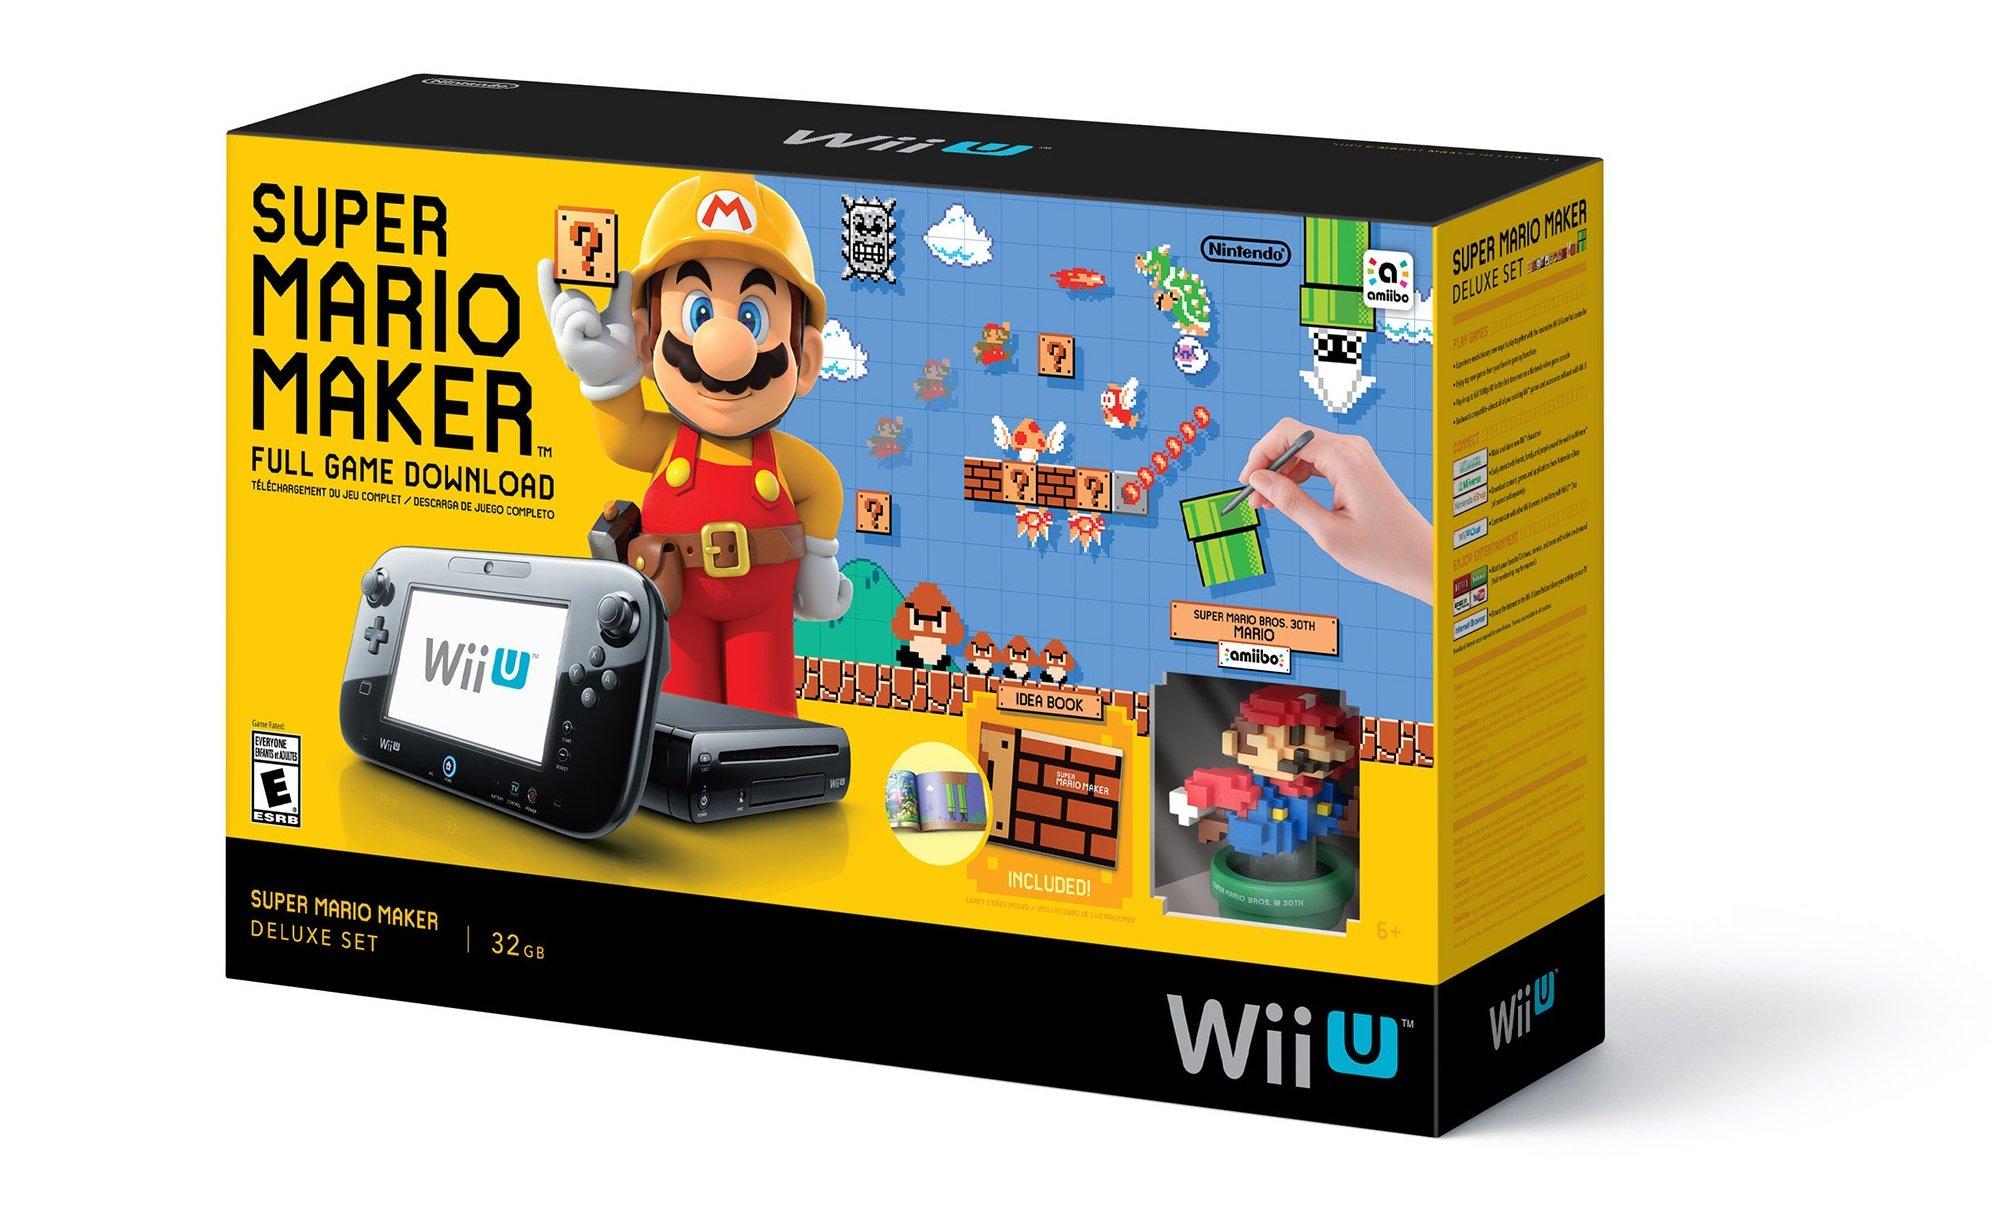 Super Mario Maker Wii U bundle coming to Walmart on September 11 ...